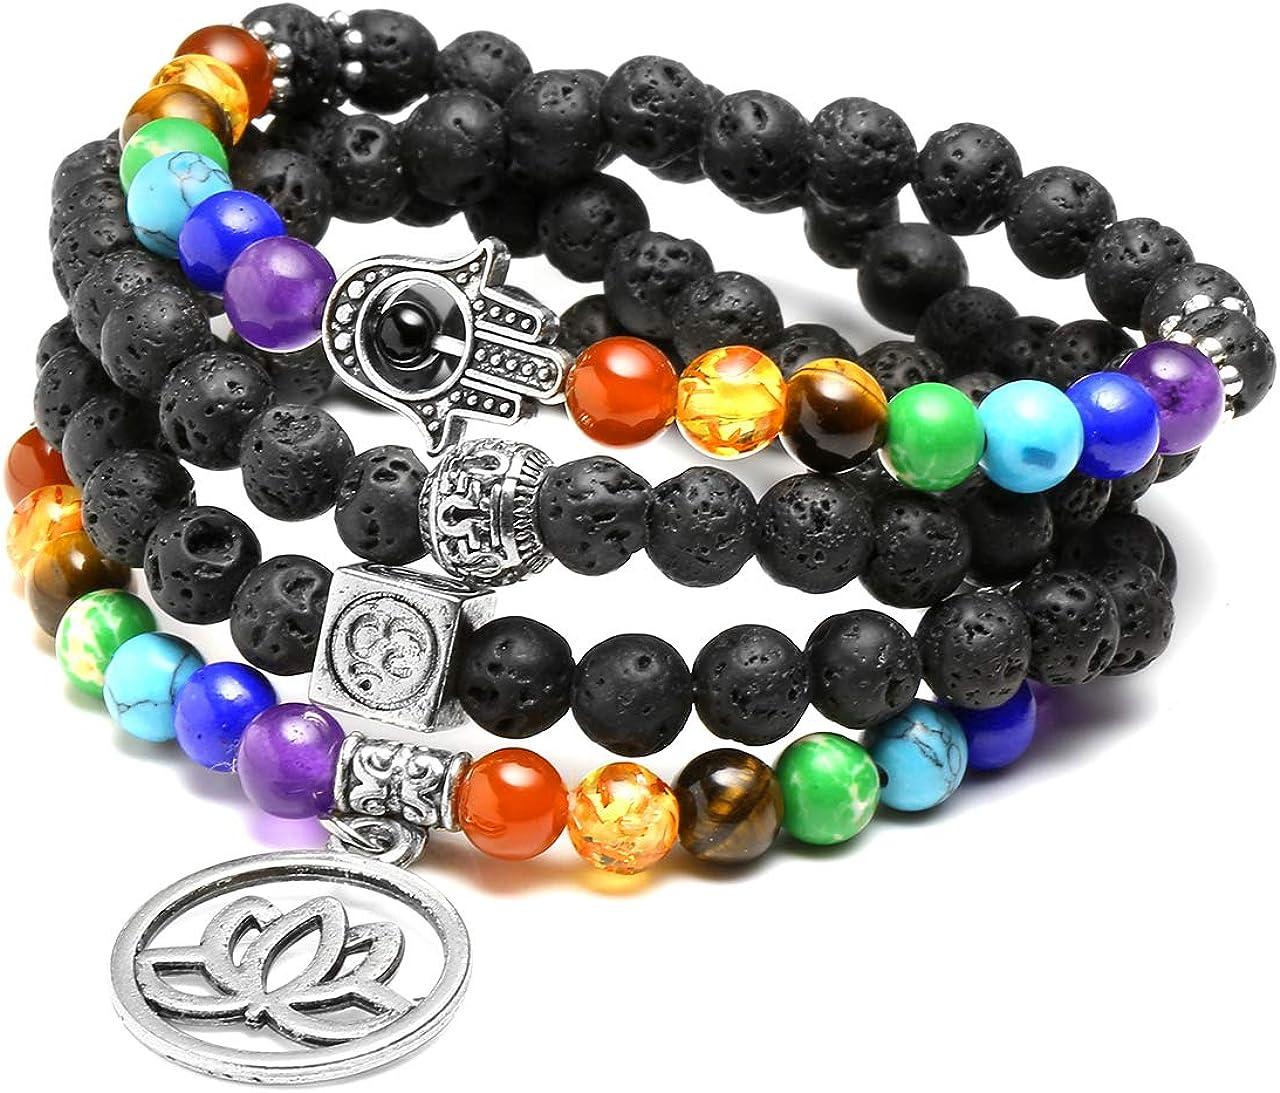 JSDDE 108 perlas piedras preciosas Yoga pulsera Wickelarmabnd 7 Chakra Lotus seguidores Perlenarmband Healing Reiki Mala cadena Tibetische Halskette Gebetskette